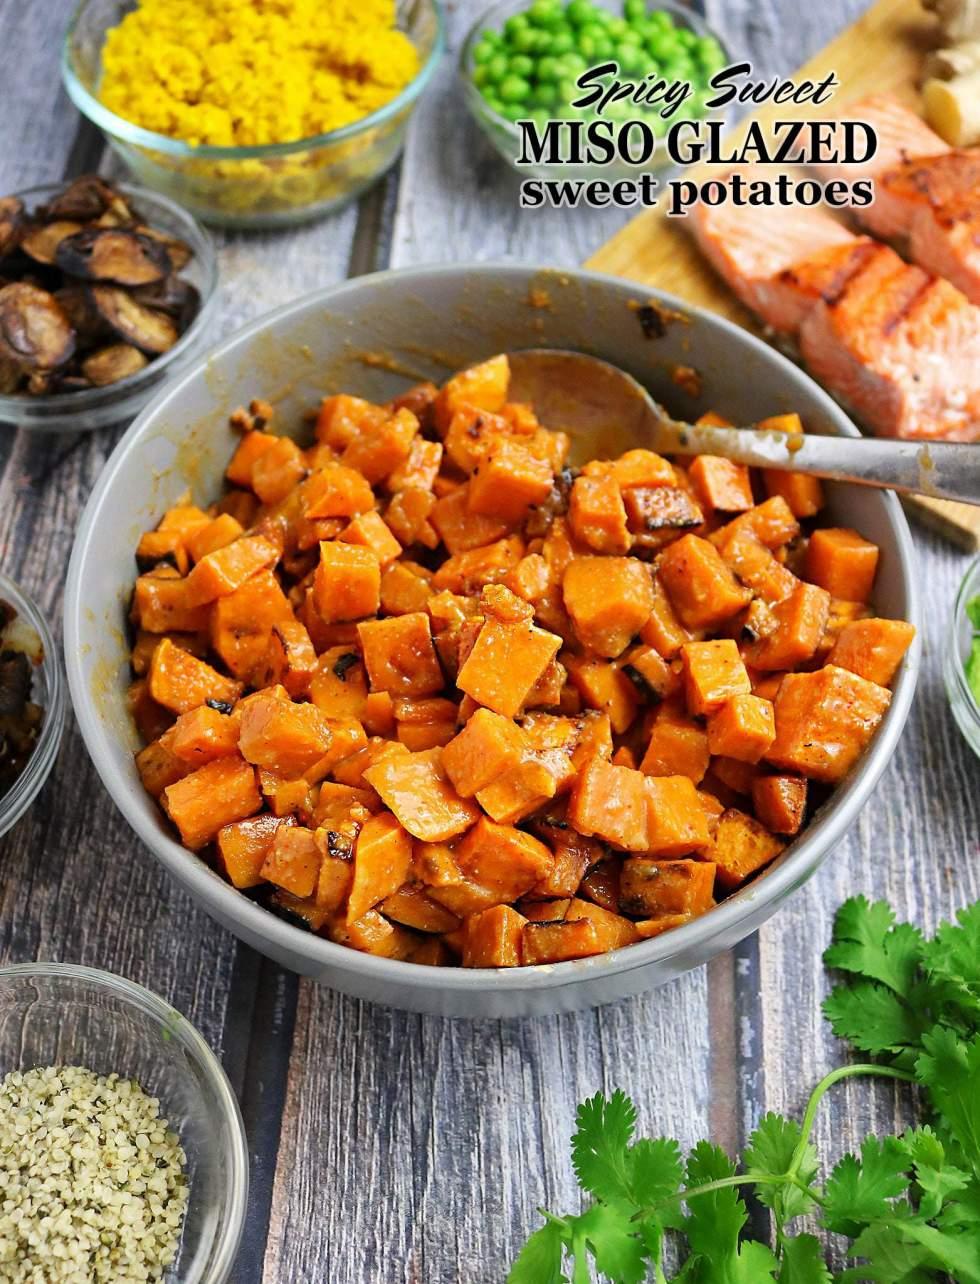 Spicy Sweet Miso Glazed Sweet Potatoes Bowls